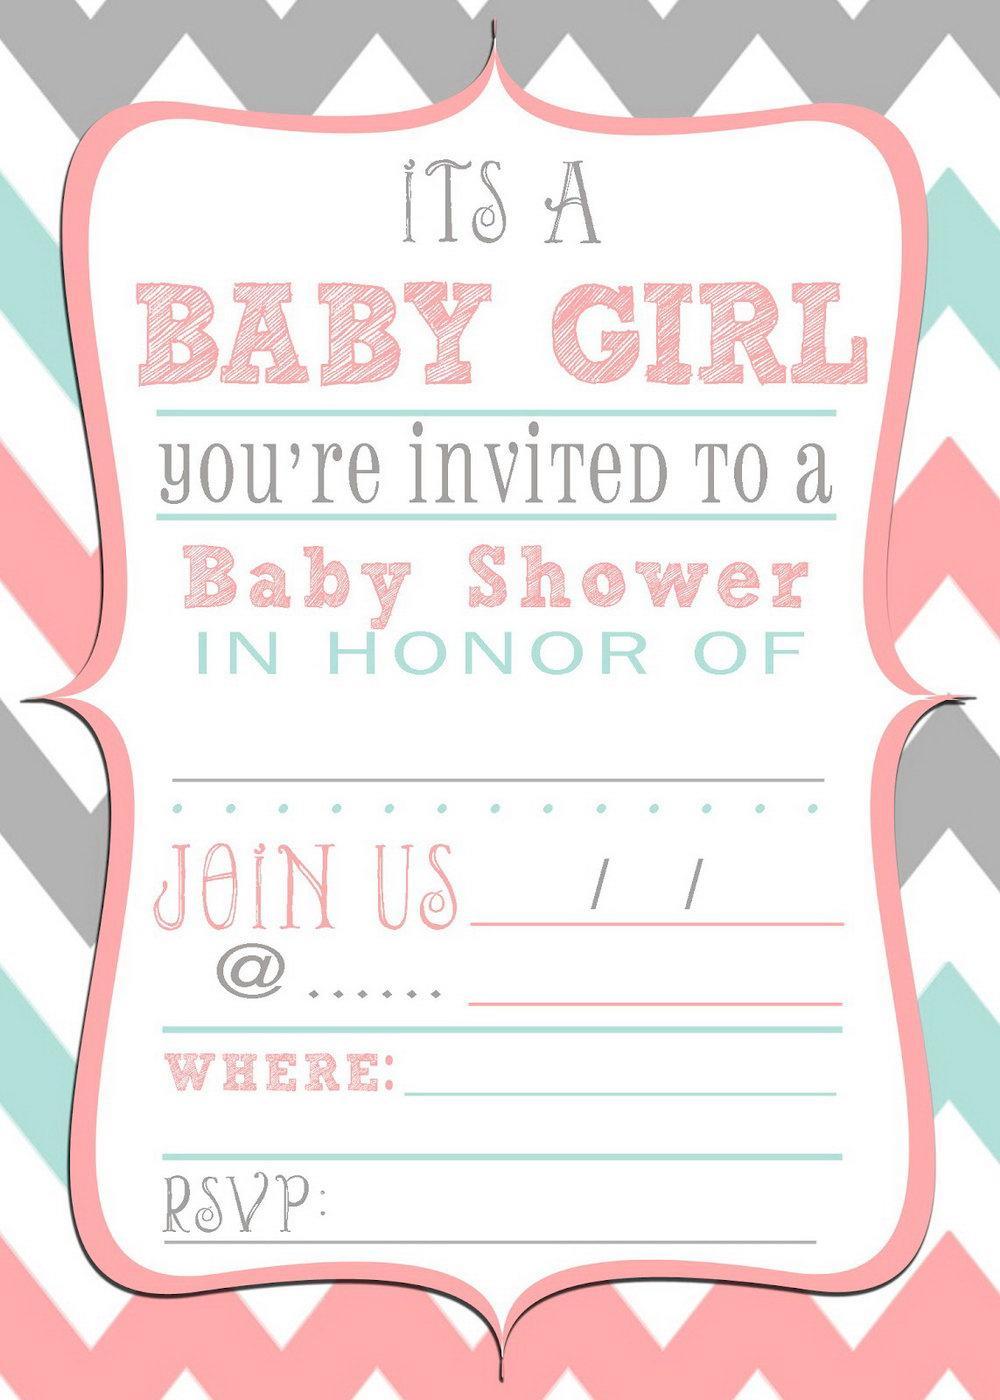 Halloween Baby Shower Invitation Template